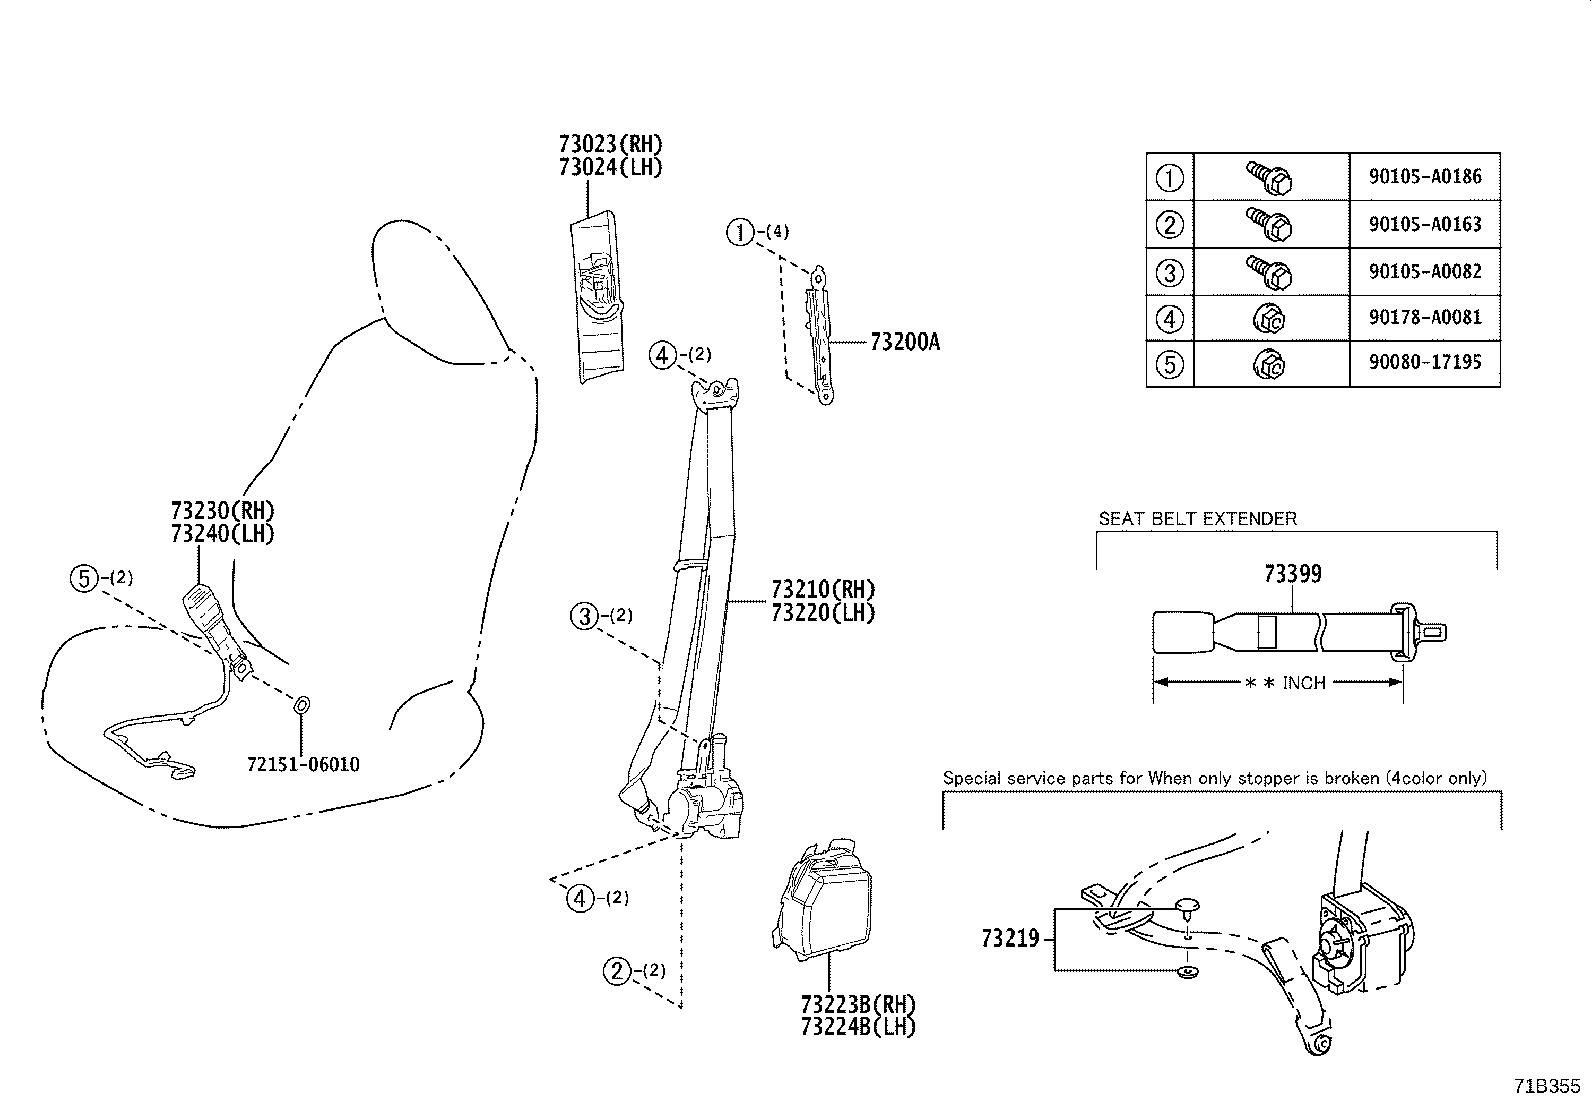 Lexus Es 350 Seat Belt Extension